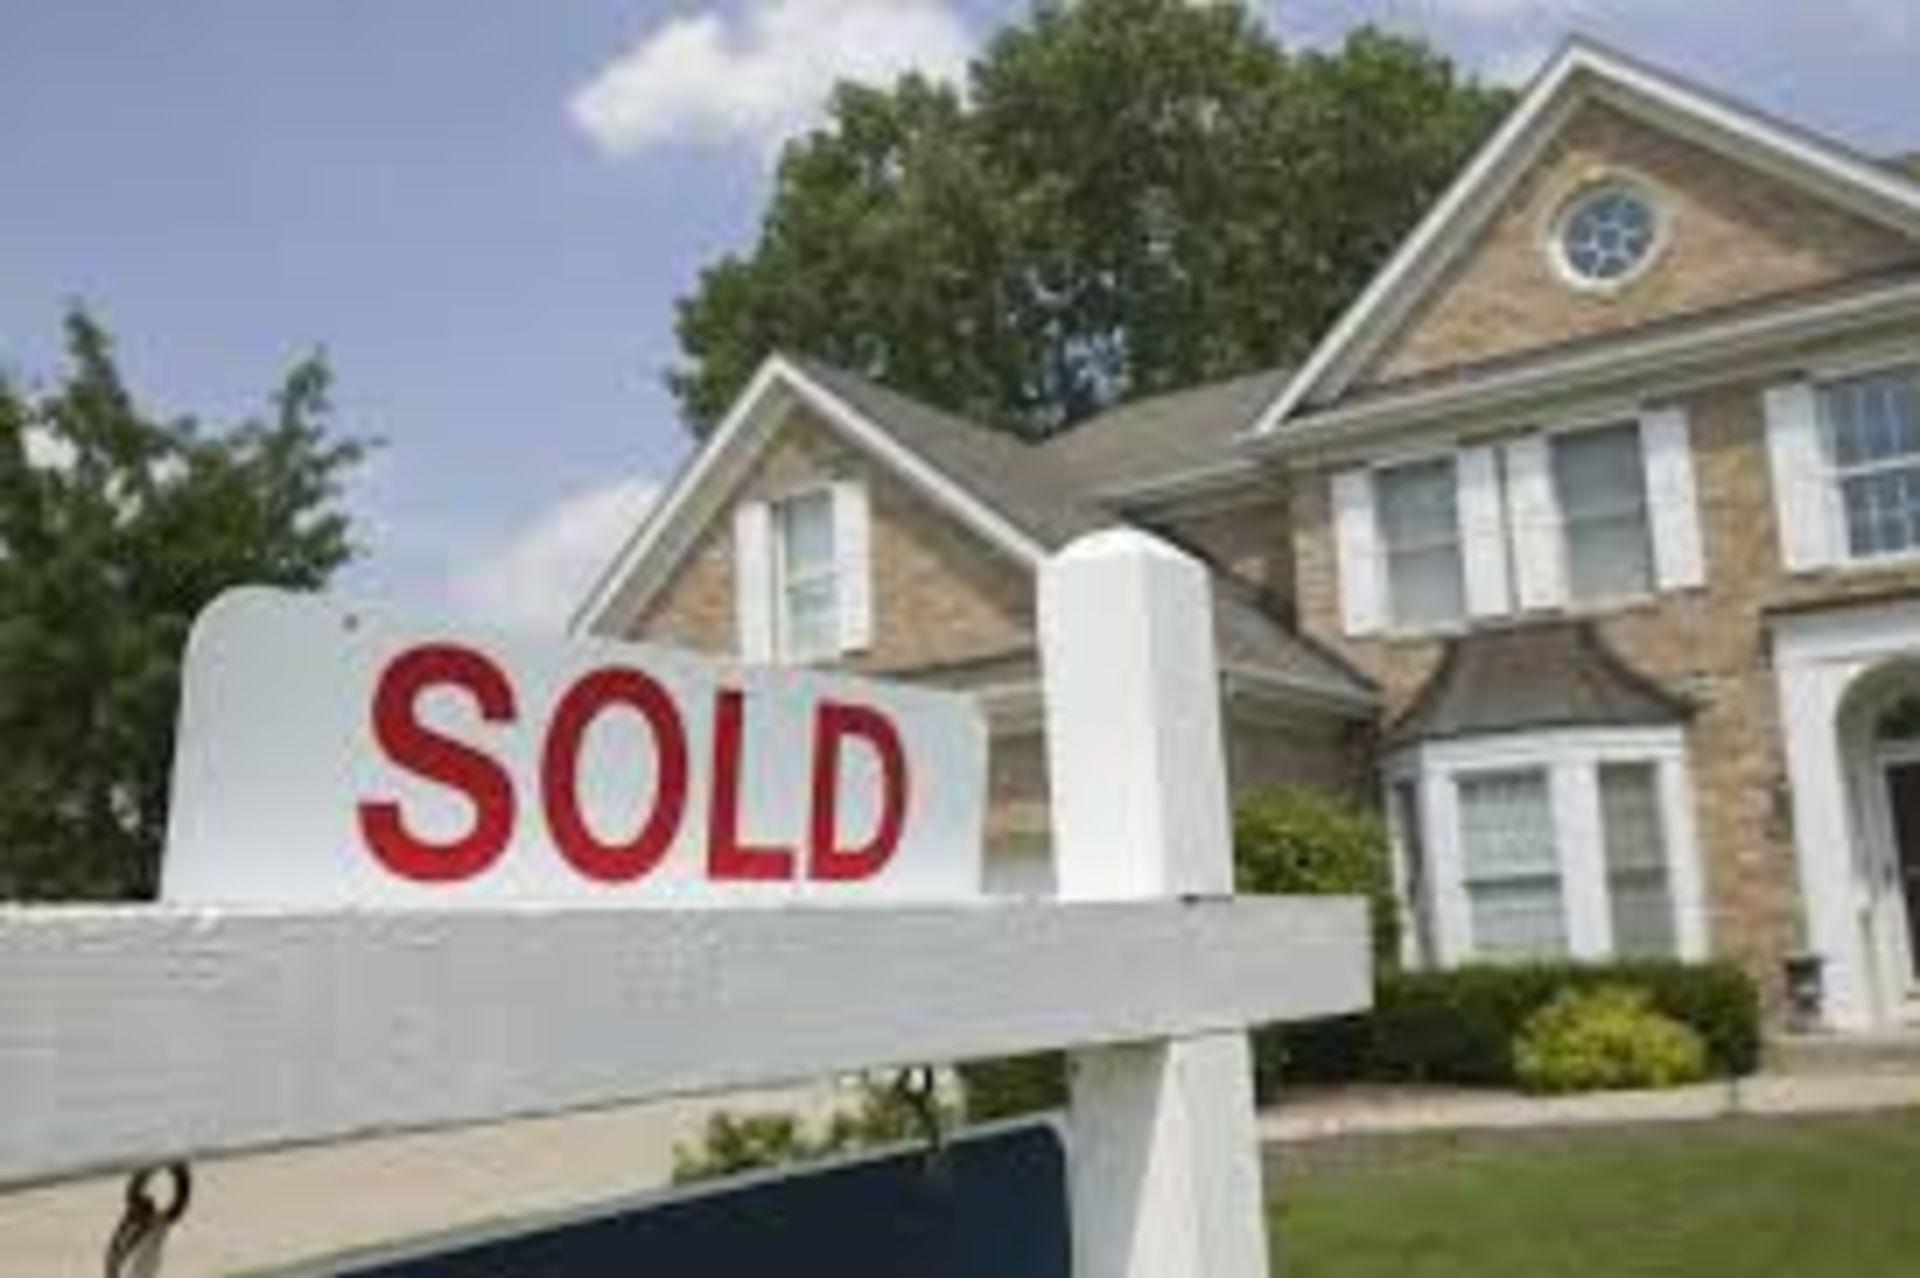 Dallas Area Home Prices Up 7.1% in 2017